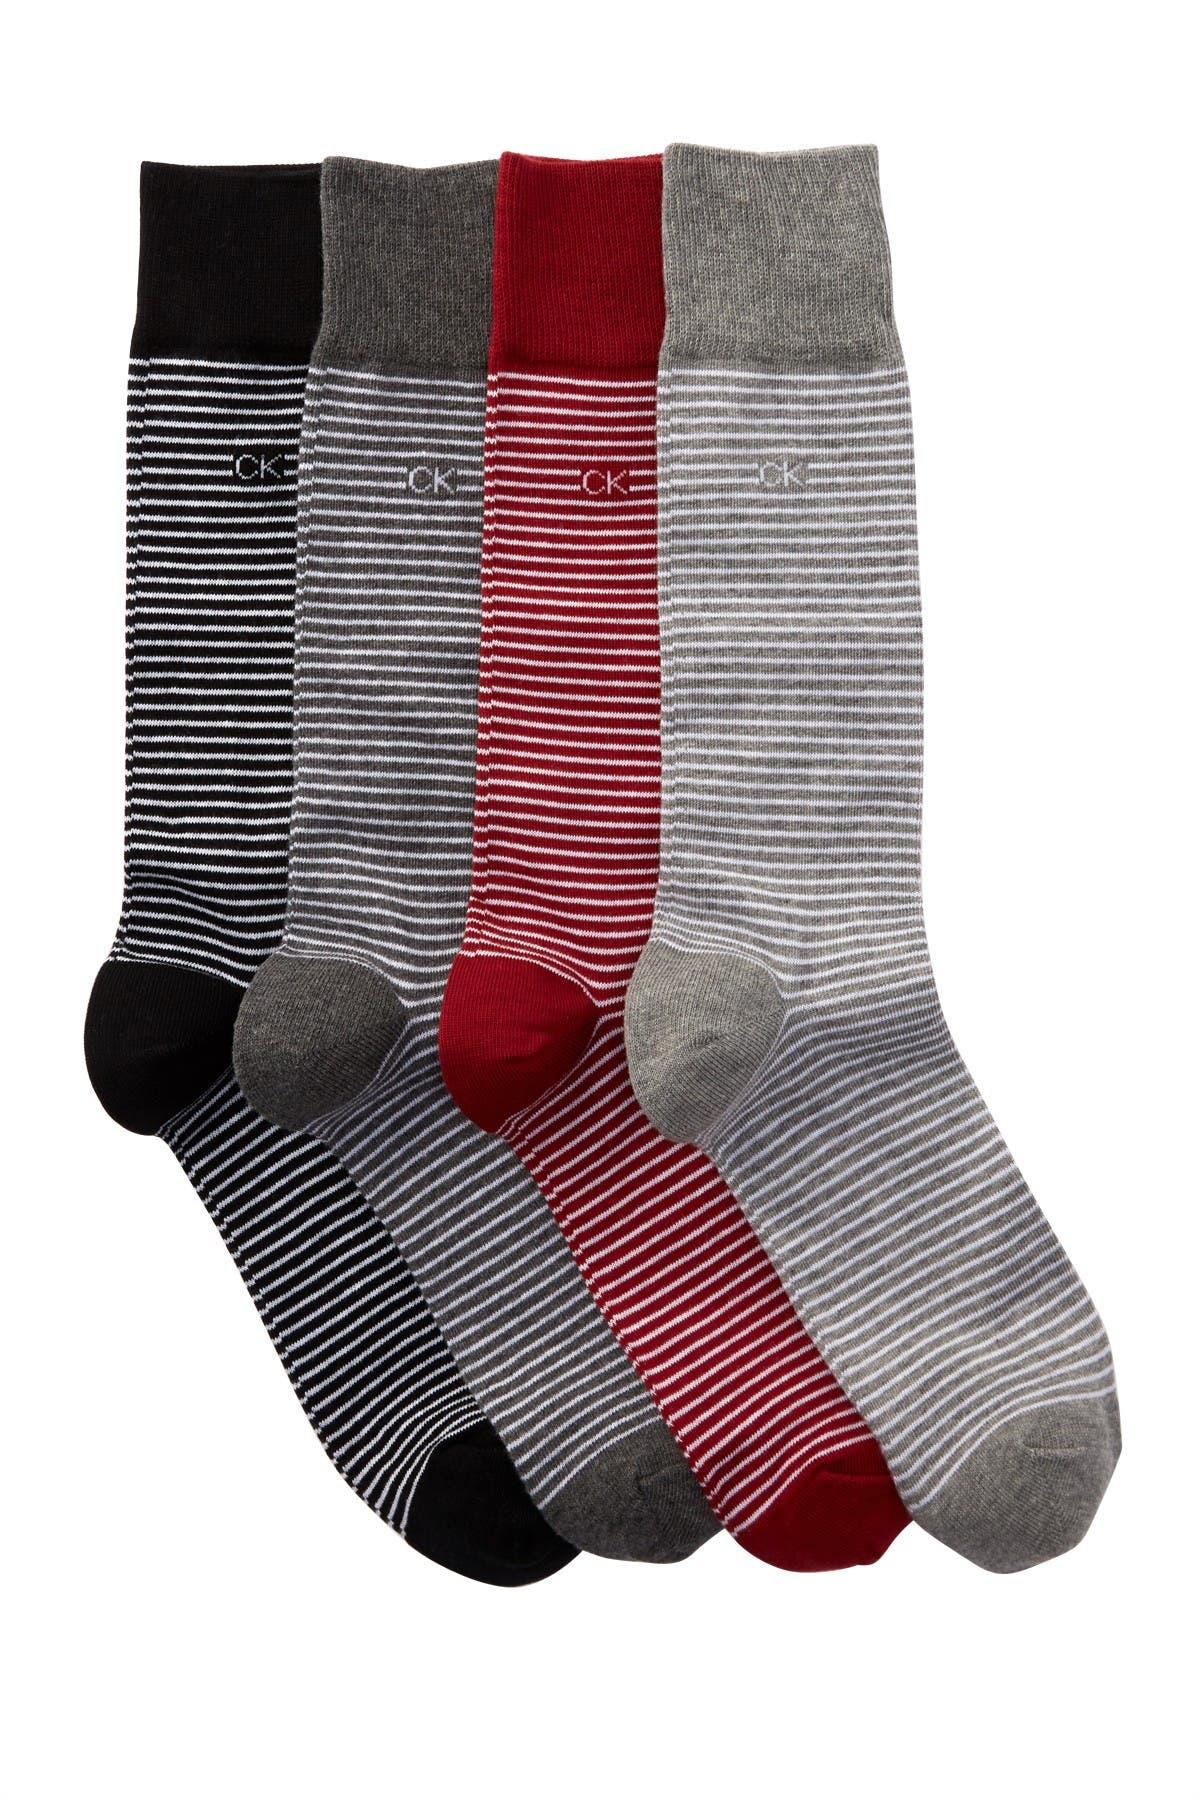 Image of Calvin Klein Fine Stripe Crew Socks - Pack of 4